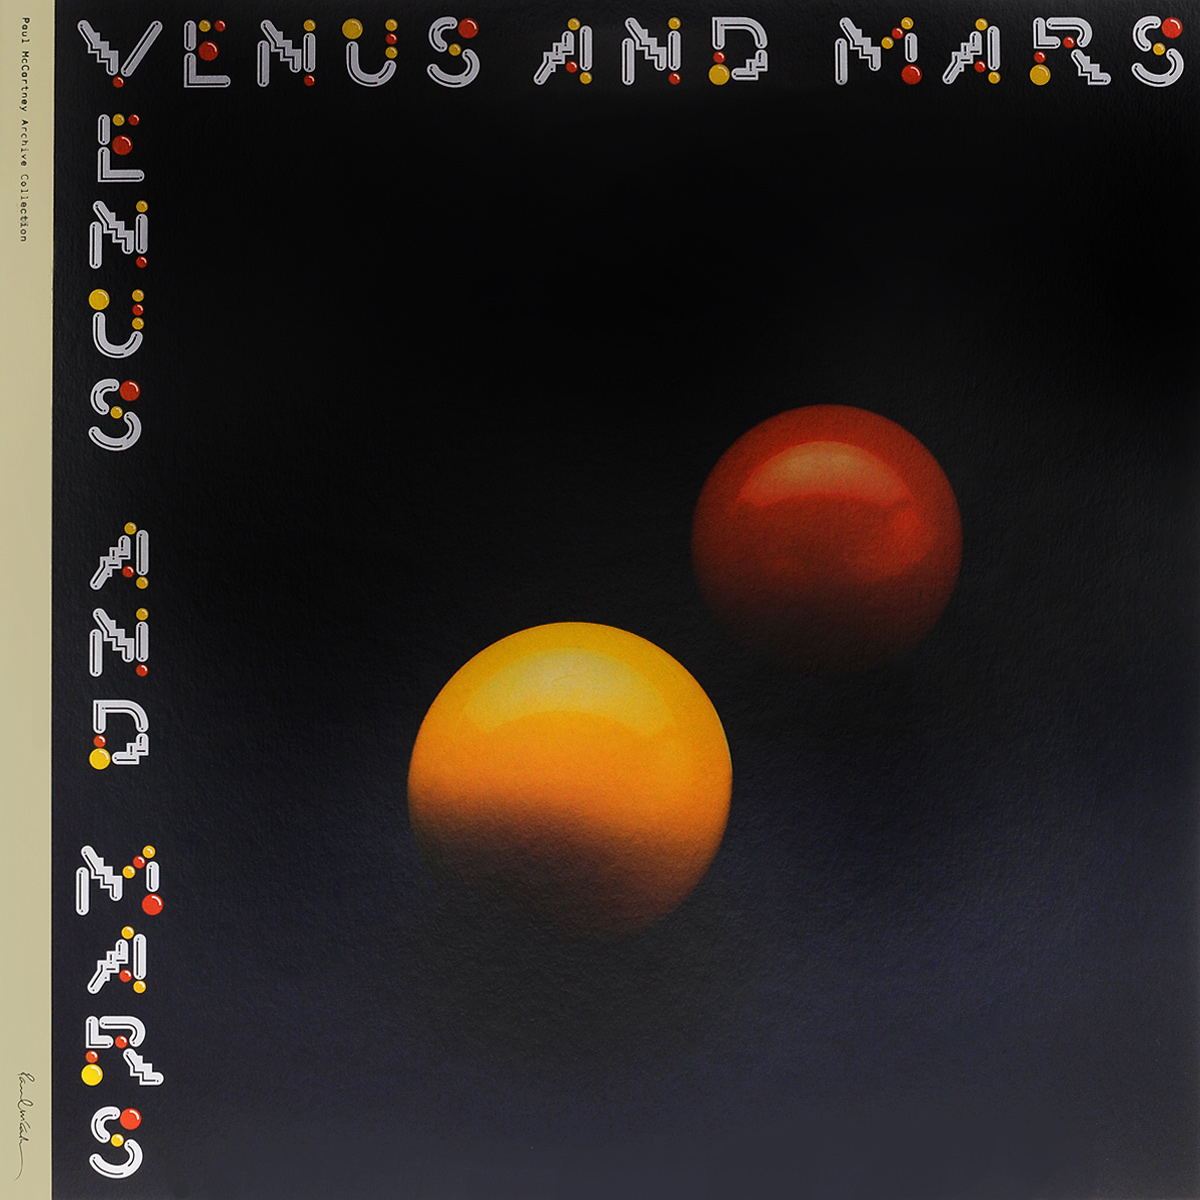 Пол Маккартни,Wings Wings. Venus And Mars. Audiophile Vinyl Edition (2 LP) eset nod32 антивирус platinum edition 3пк 2года